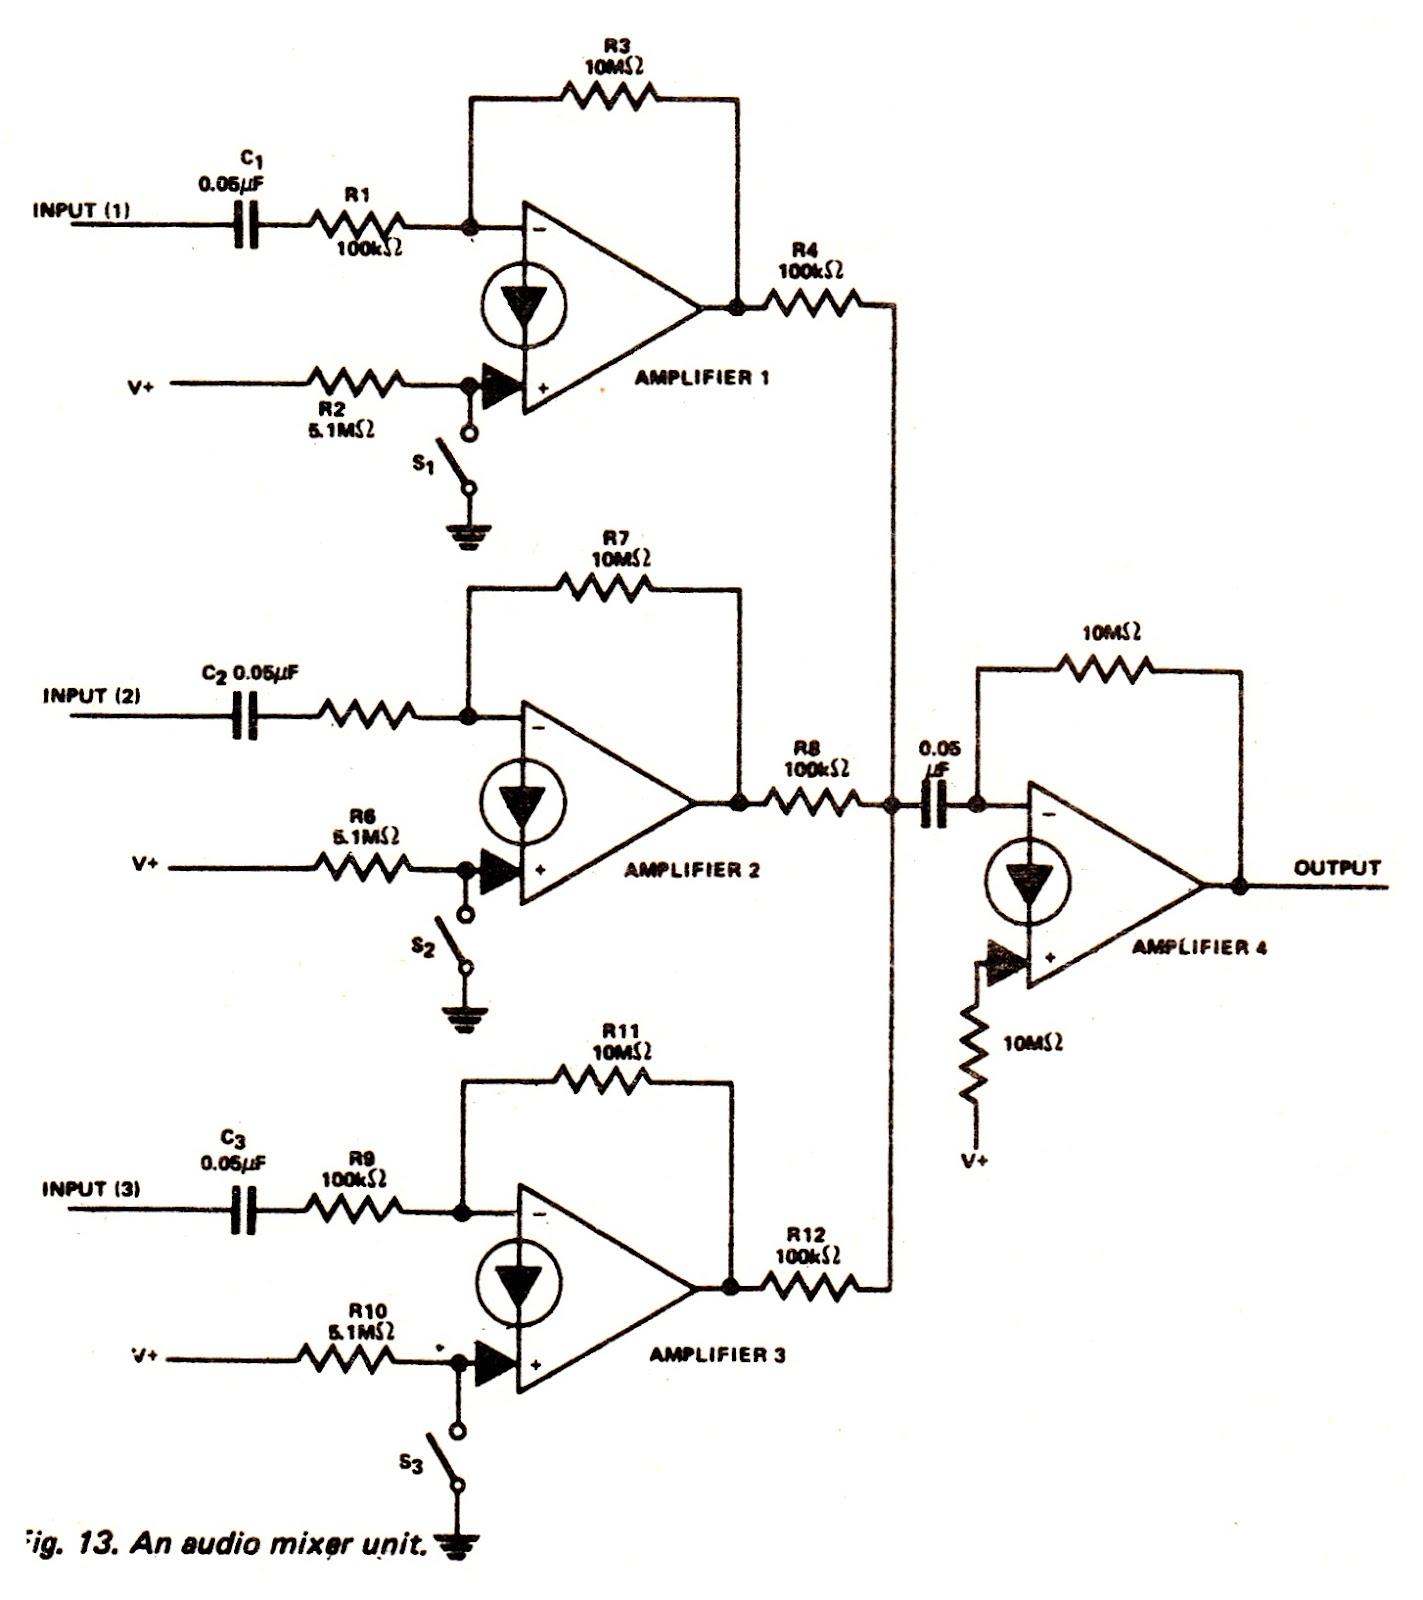 audio mixer circuit simple mixer circuit audio mixer circuit diagram passive audio mixer circuit audio mixer [ 1423 x 1600 Pixel ]